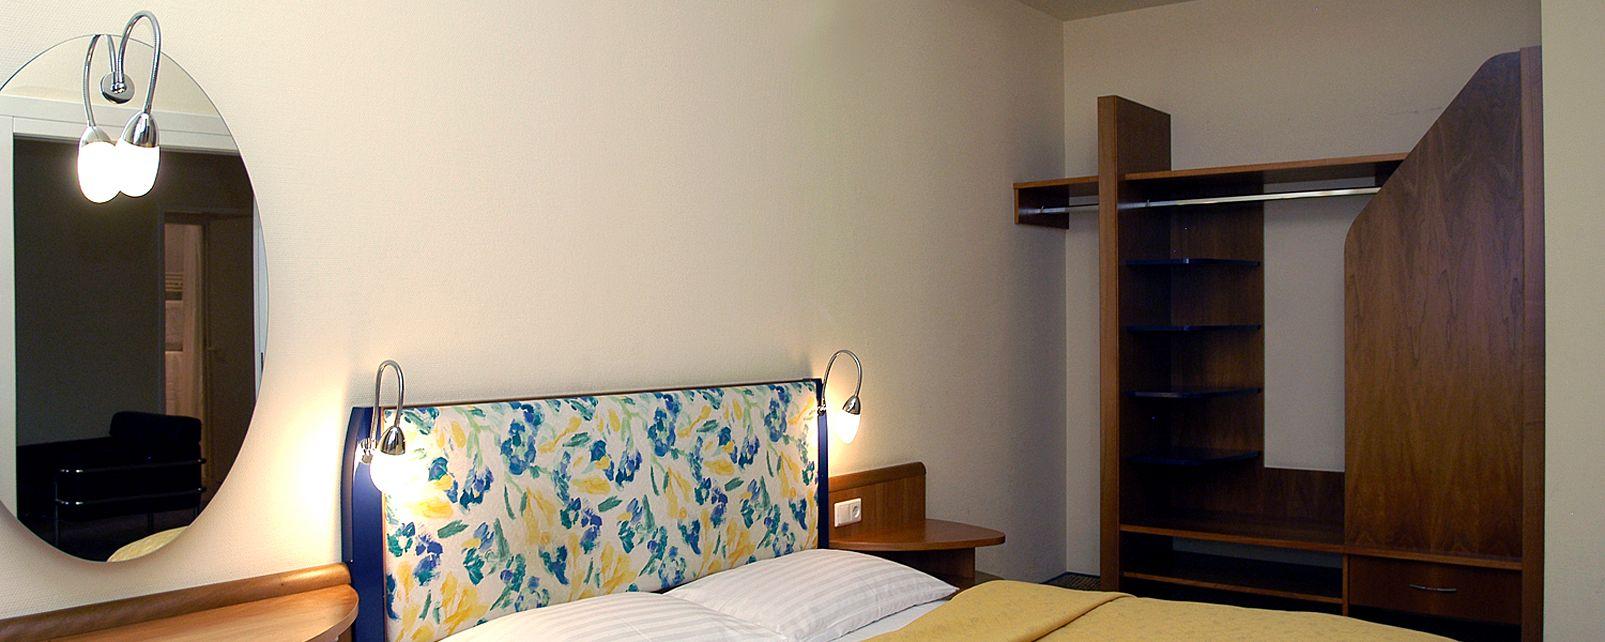 Hotel Starlight Suiten Hotel Budapest